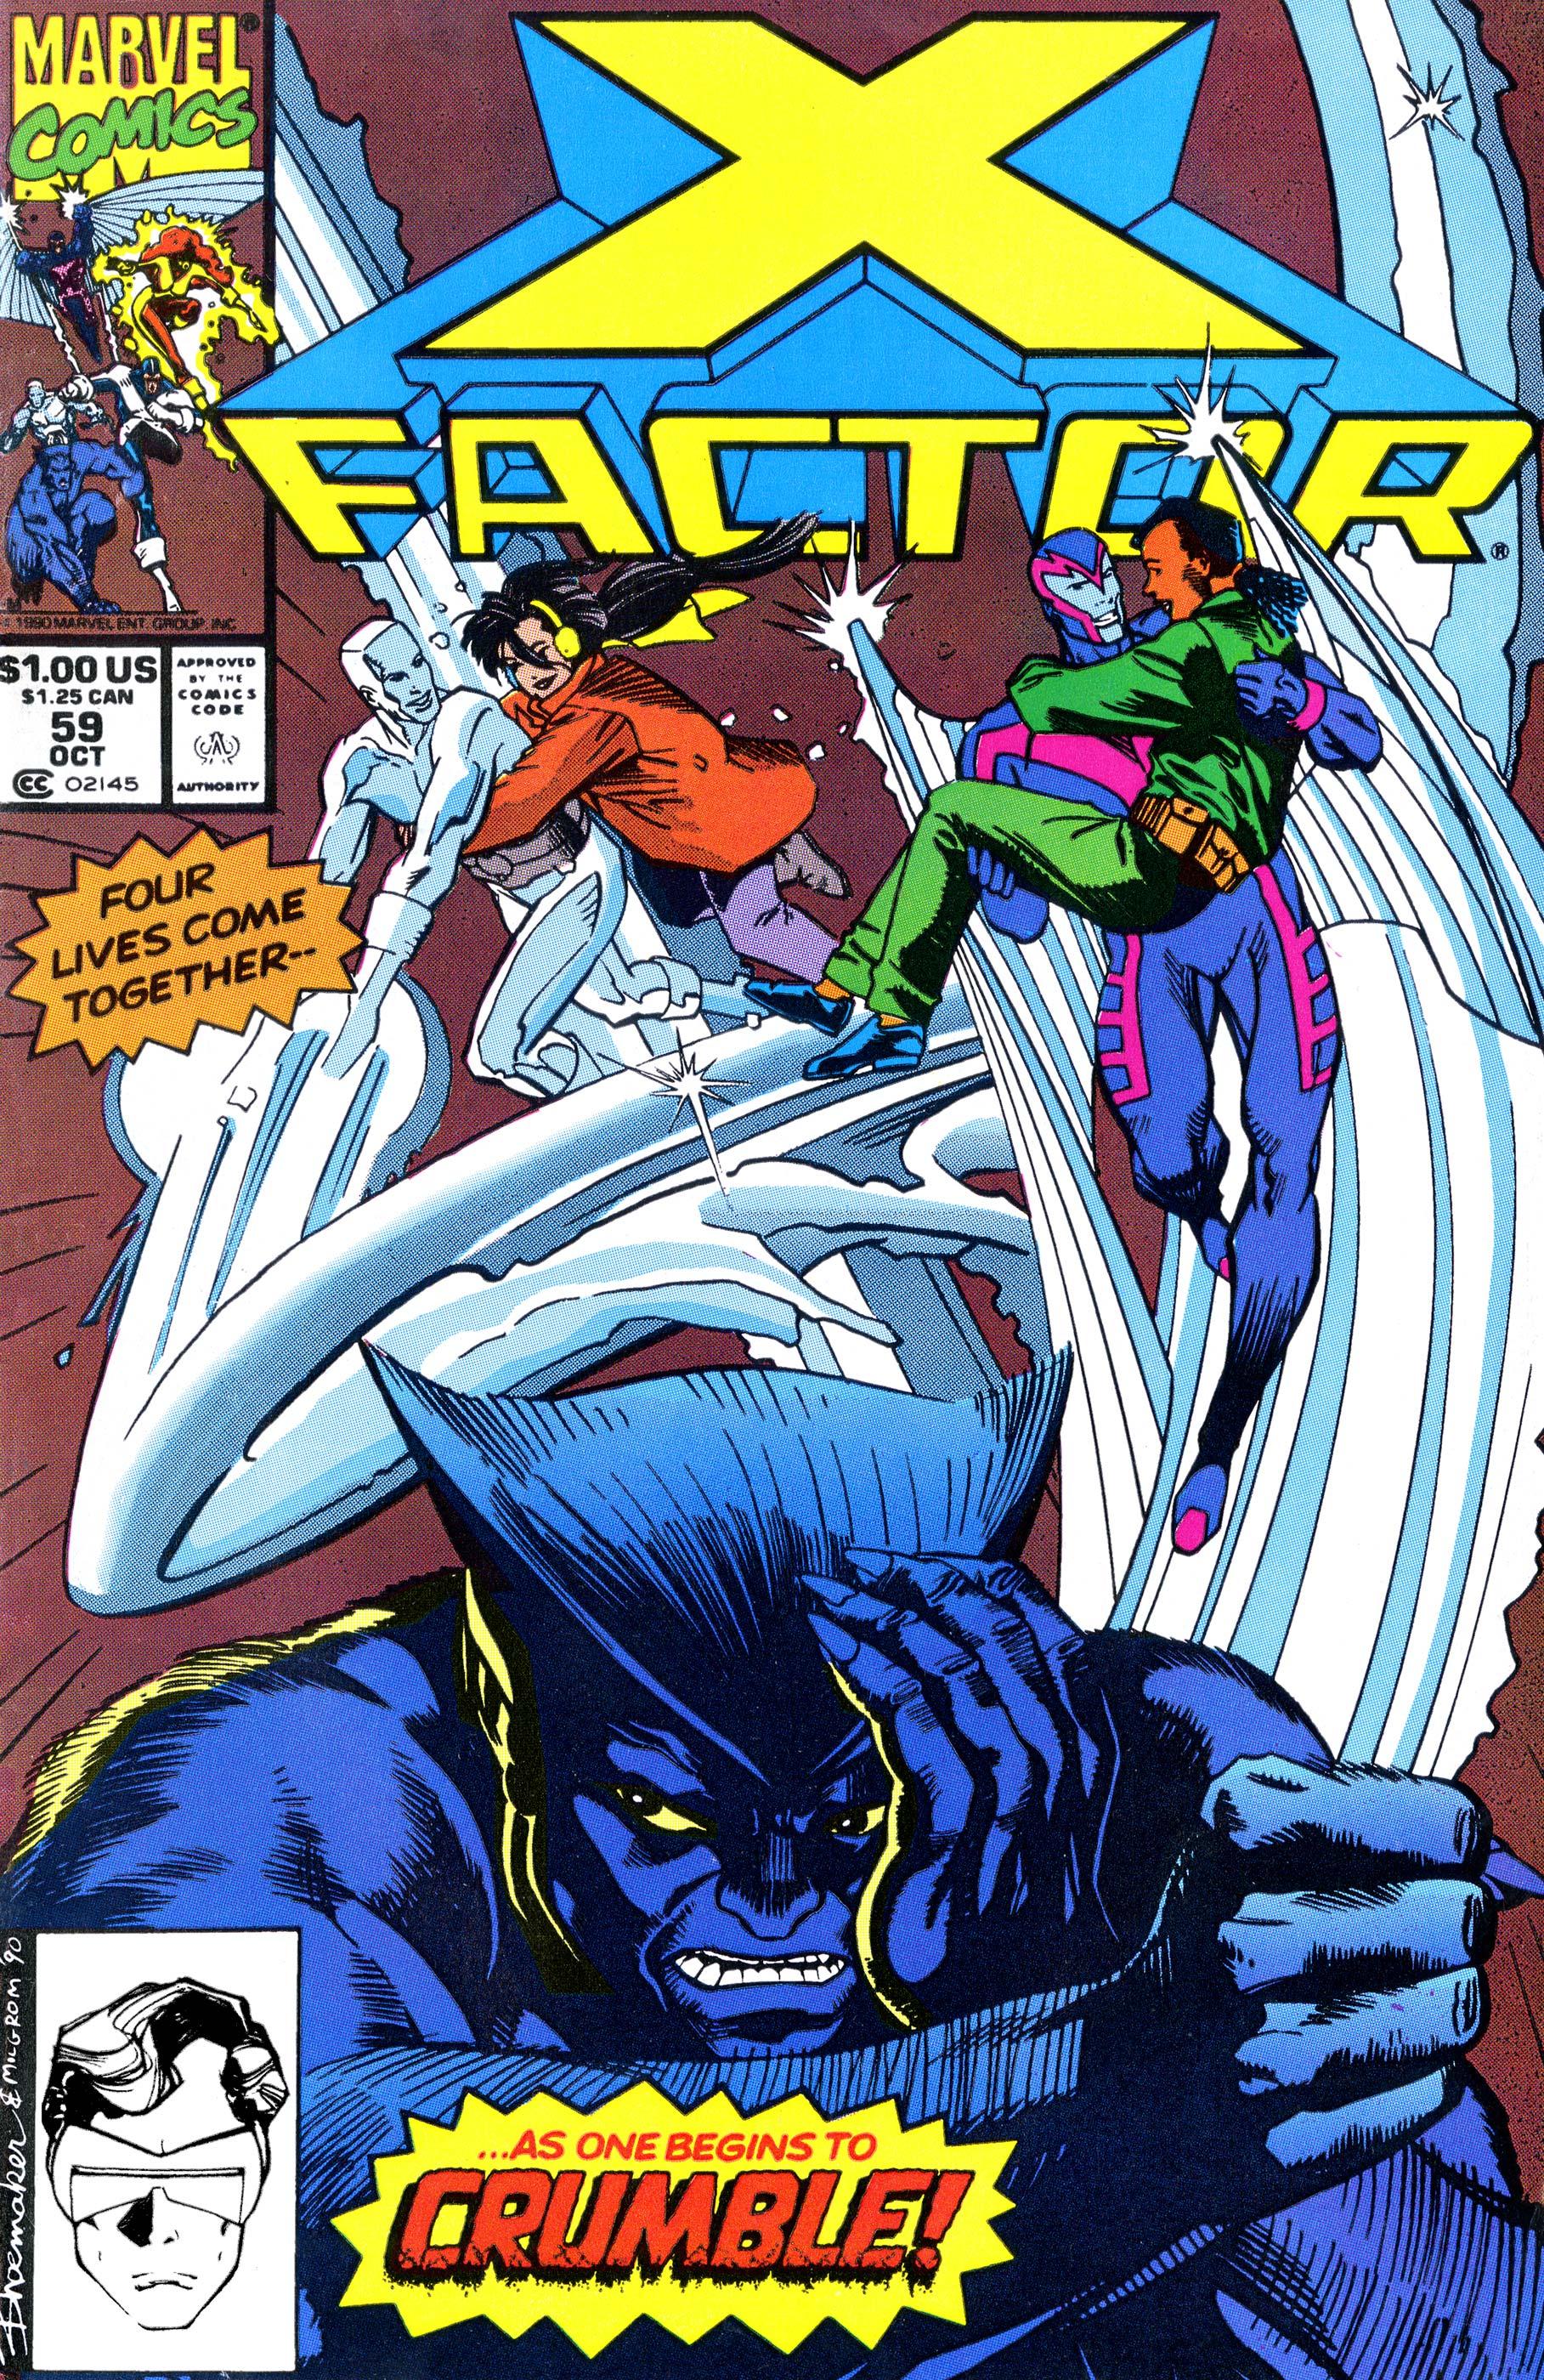 X-Factor (1986) #59